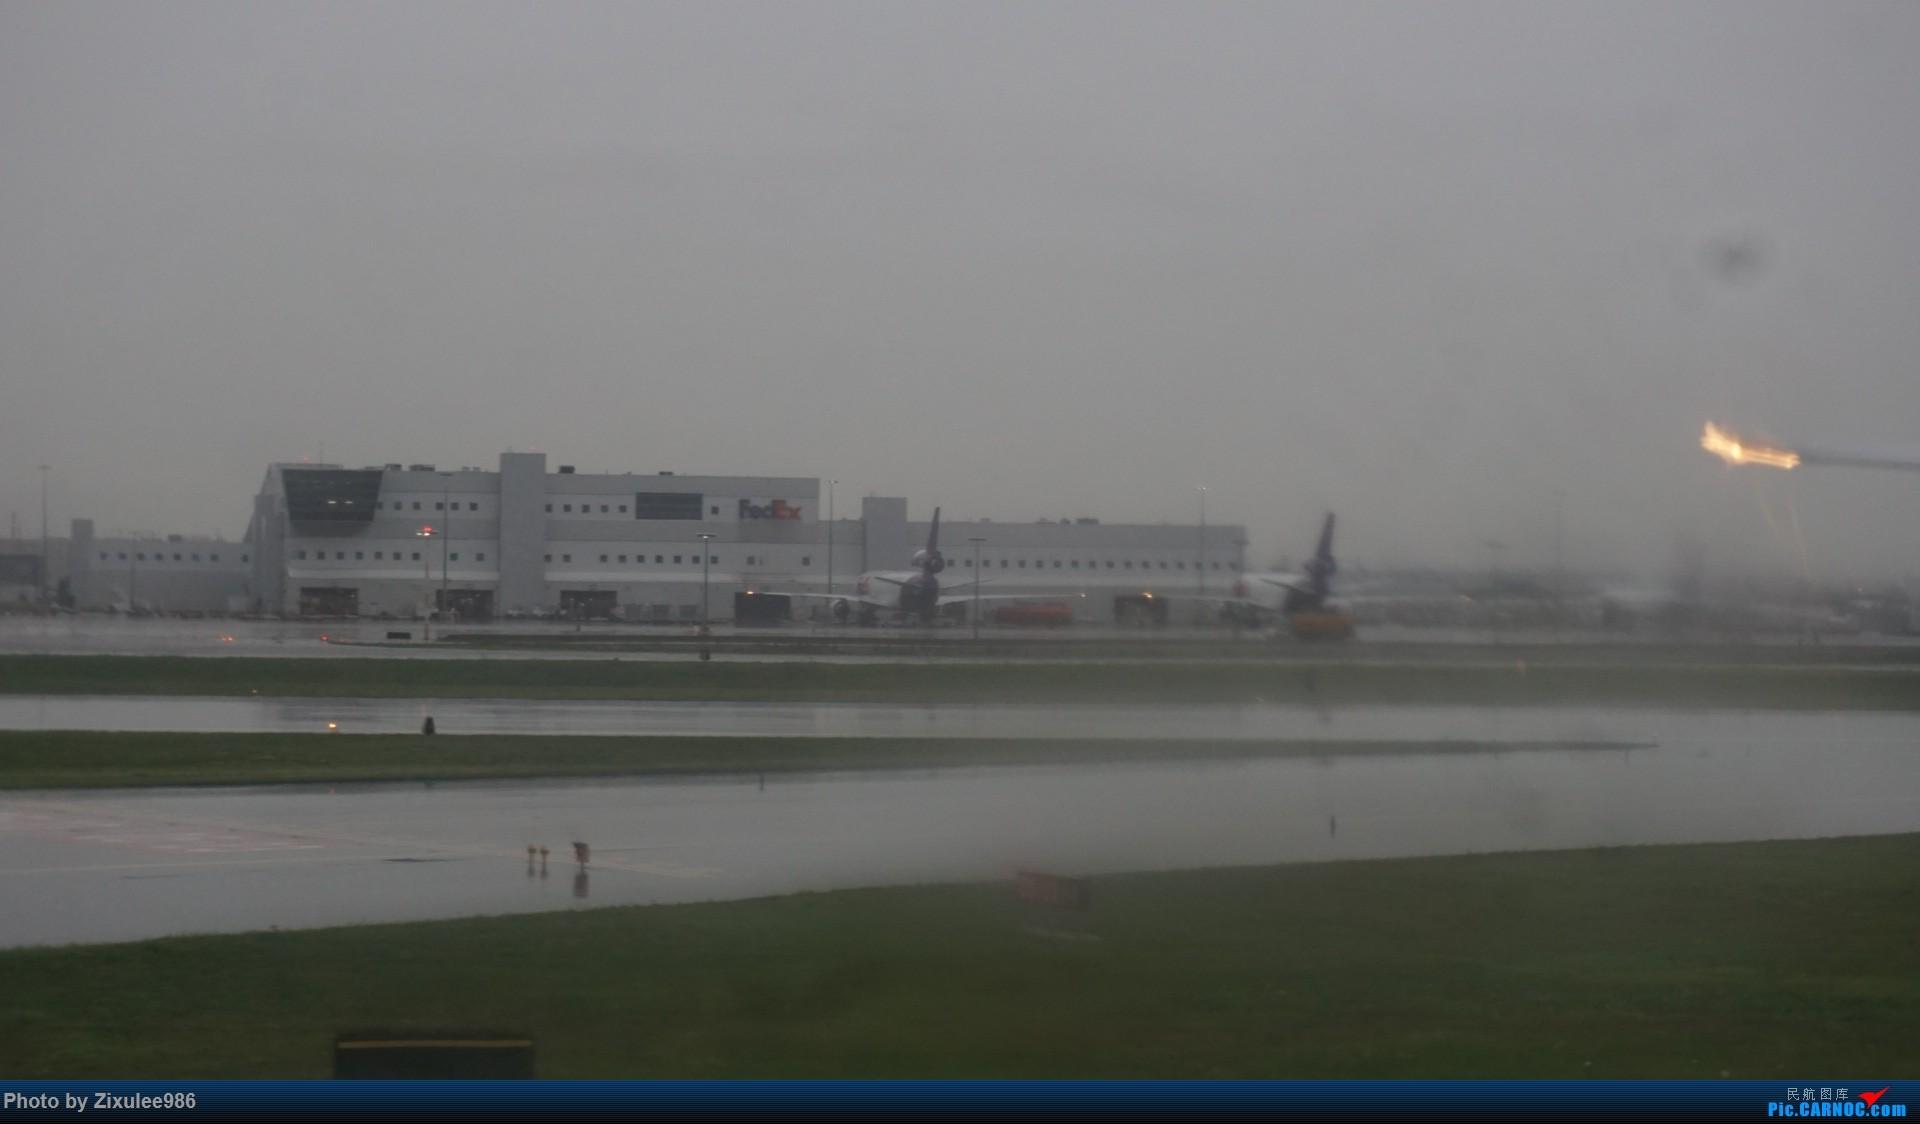 Re:[原创]加拿大21日游学之旅 (二)~加航AC28..PVG-YYZ到达多村后的雨天~多图缓更(将会附上上一集忘发的flightlog)请各位大侠谅解~ BOEING 777-333 (ER) C-FITL 加拿大多伦多皮尔逊国际机场